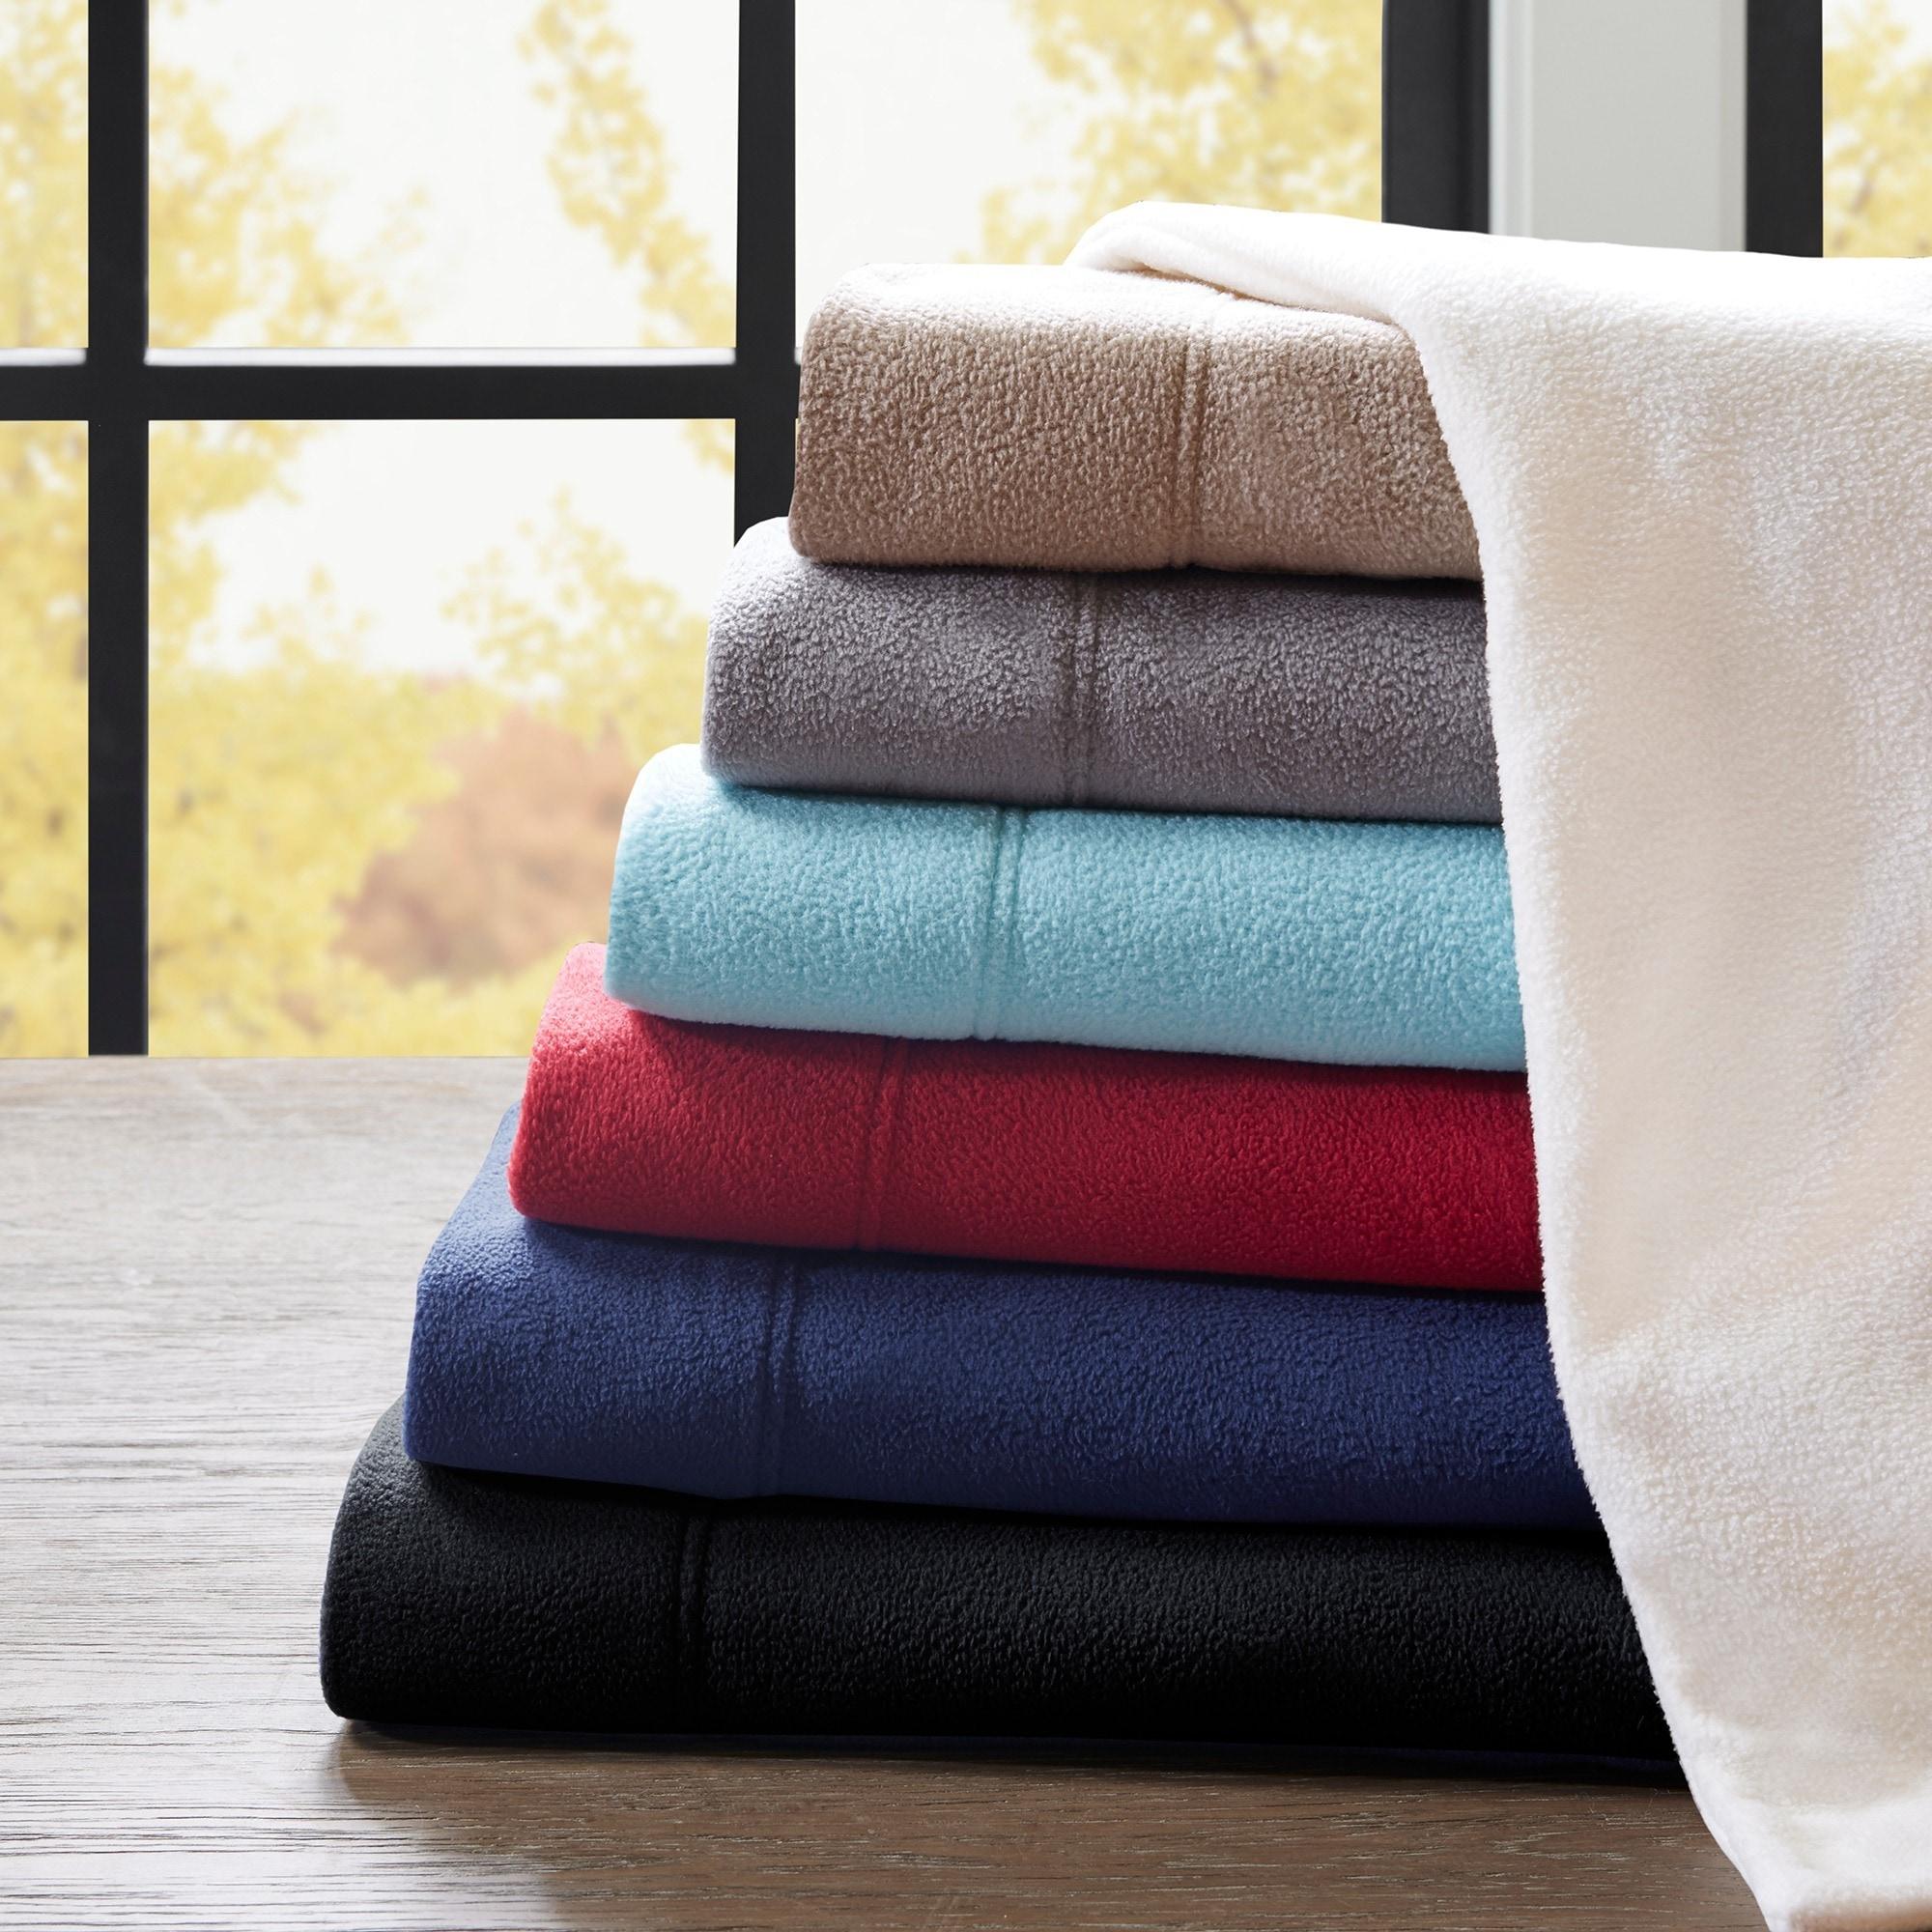 Peak Performance 3M Scotchgard Stain Resistant Fleece Sheet Set